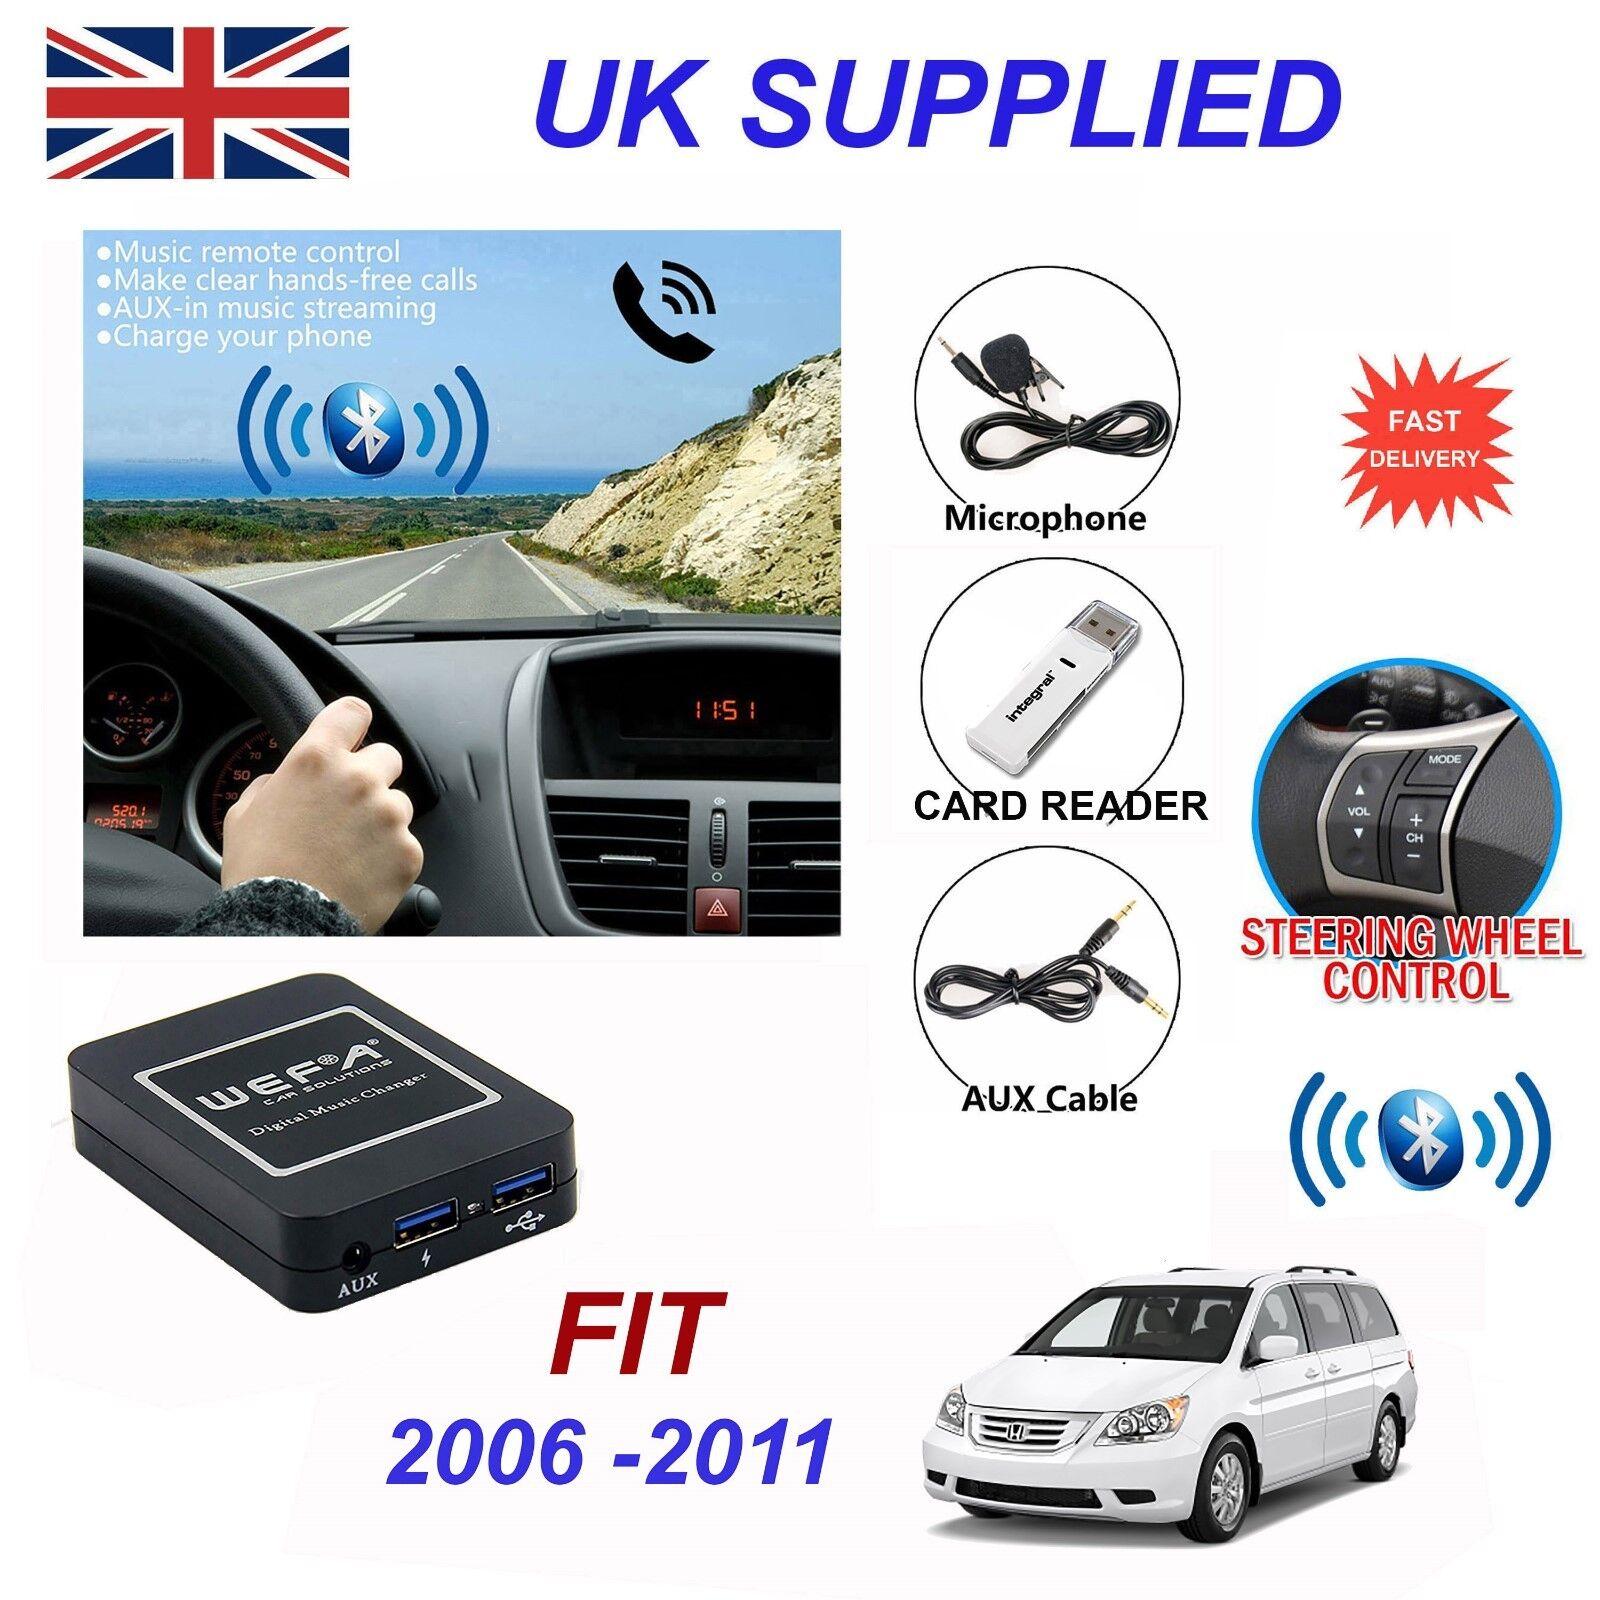 Honda Fit Bluetooth Hands Free Phone AUX Input MP3 2xUSB Charger Module 2.4